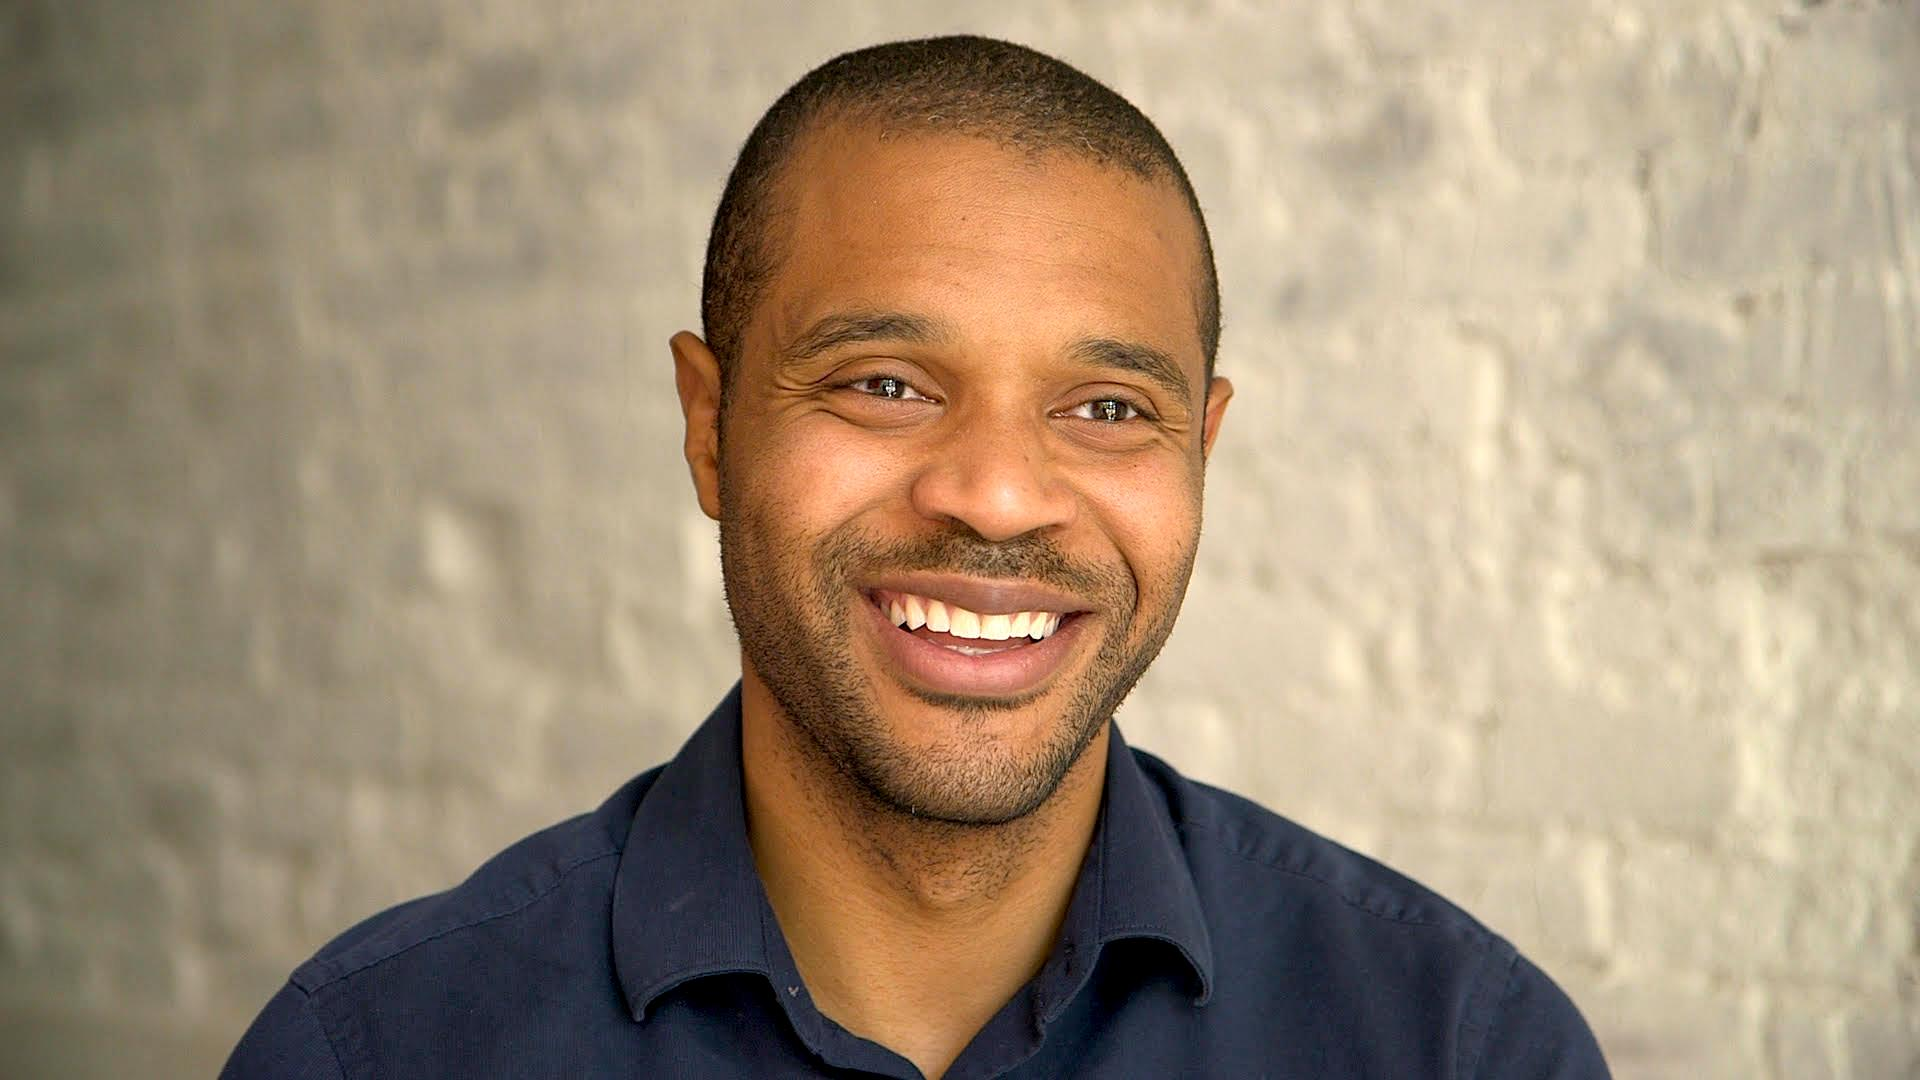 Teacher set to be N.Y.'s first Black gay state senator